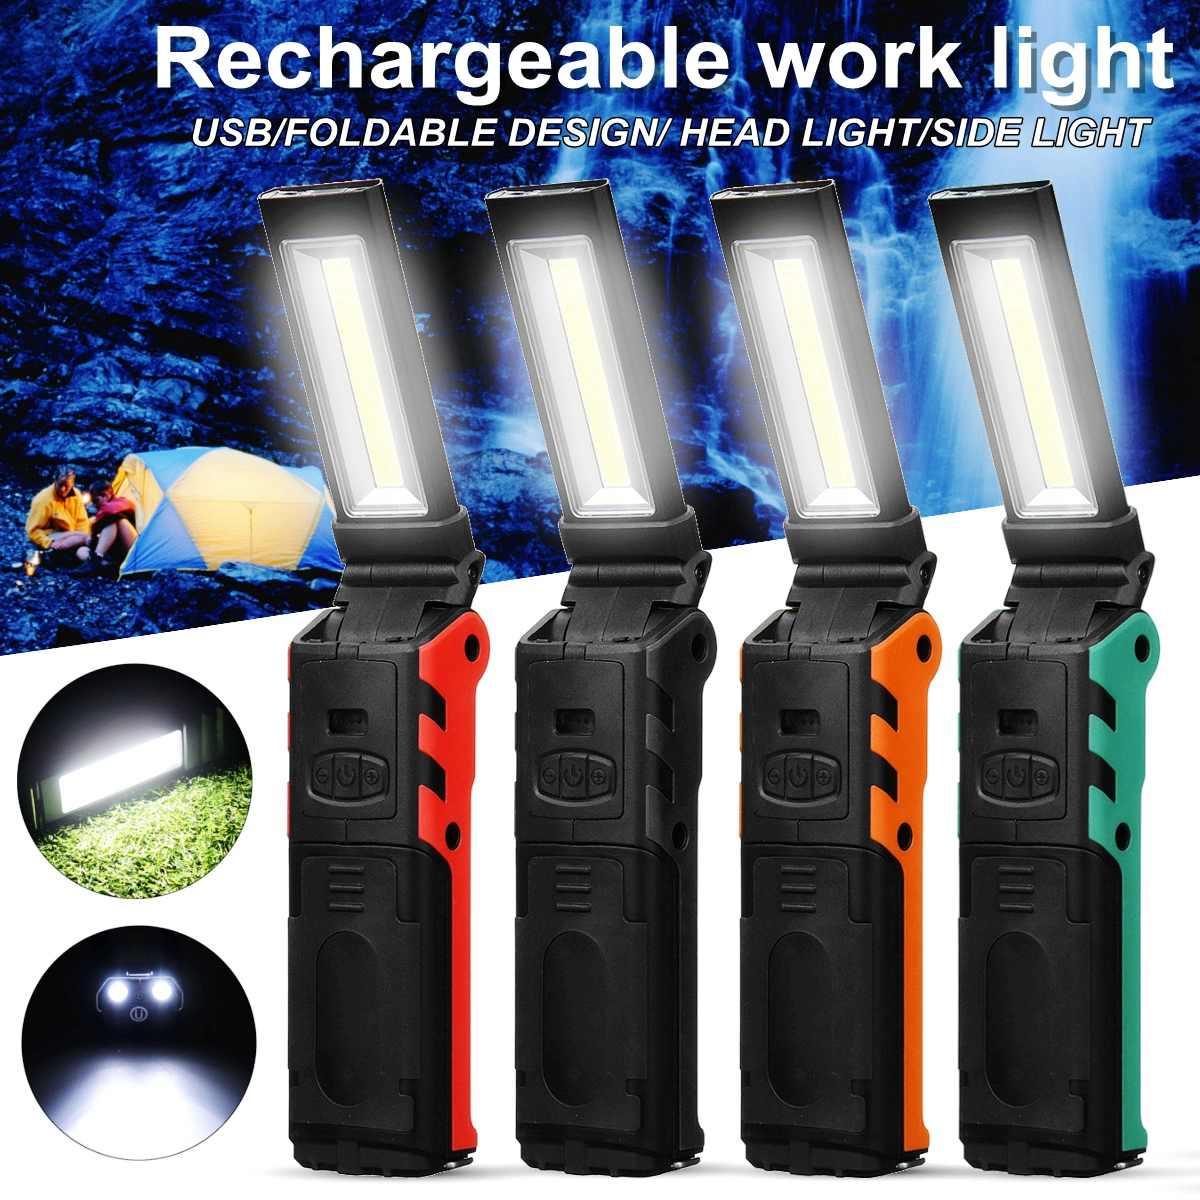 ESEN106 cob portable spotlight work light led usb rechargeable power bank 2 modes hook case magnetic 18650 battery waterproof